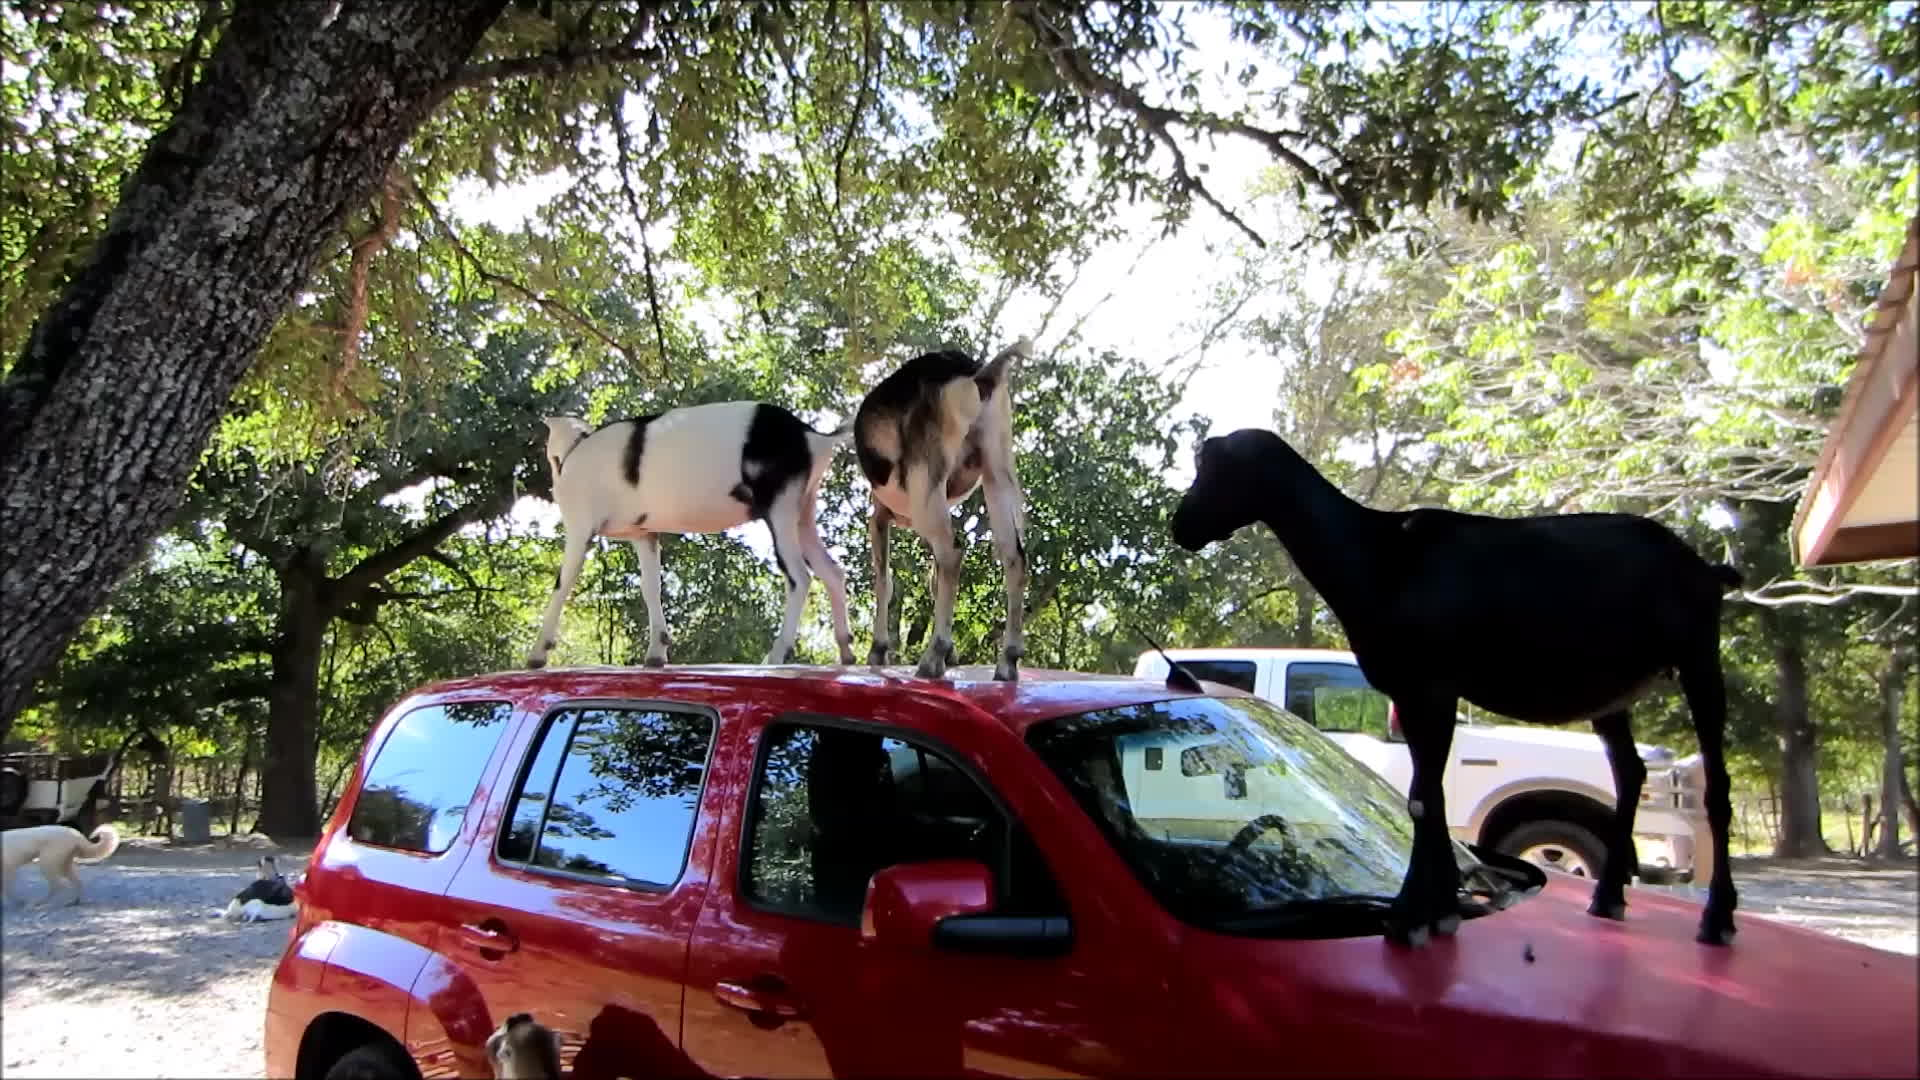 goat, goatparkour, knsfarm, rooftop, Rooftop Fight GIFs